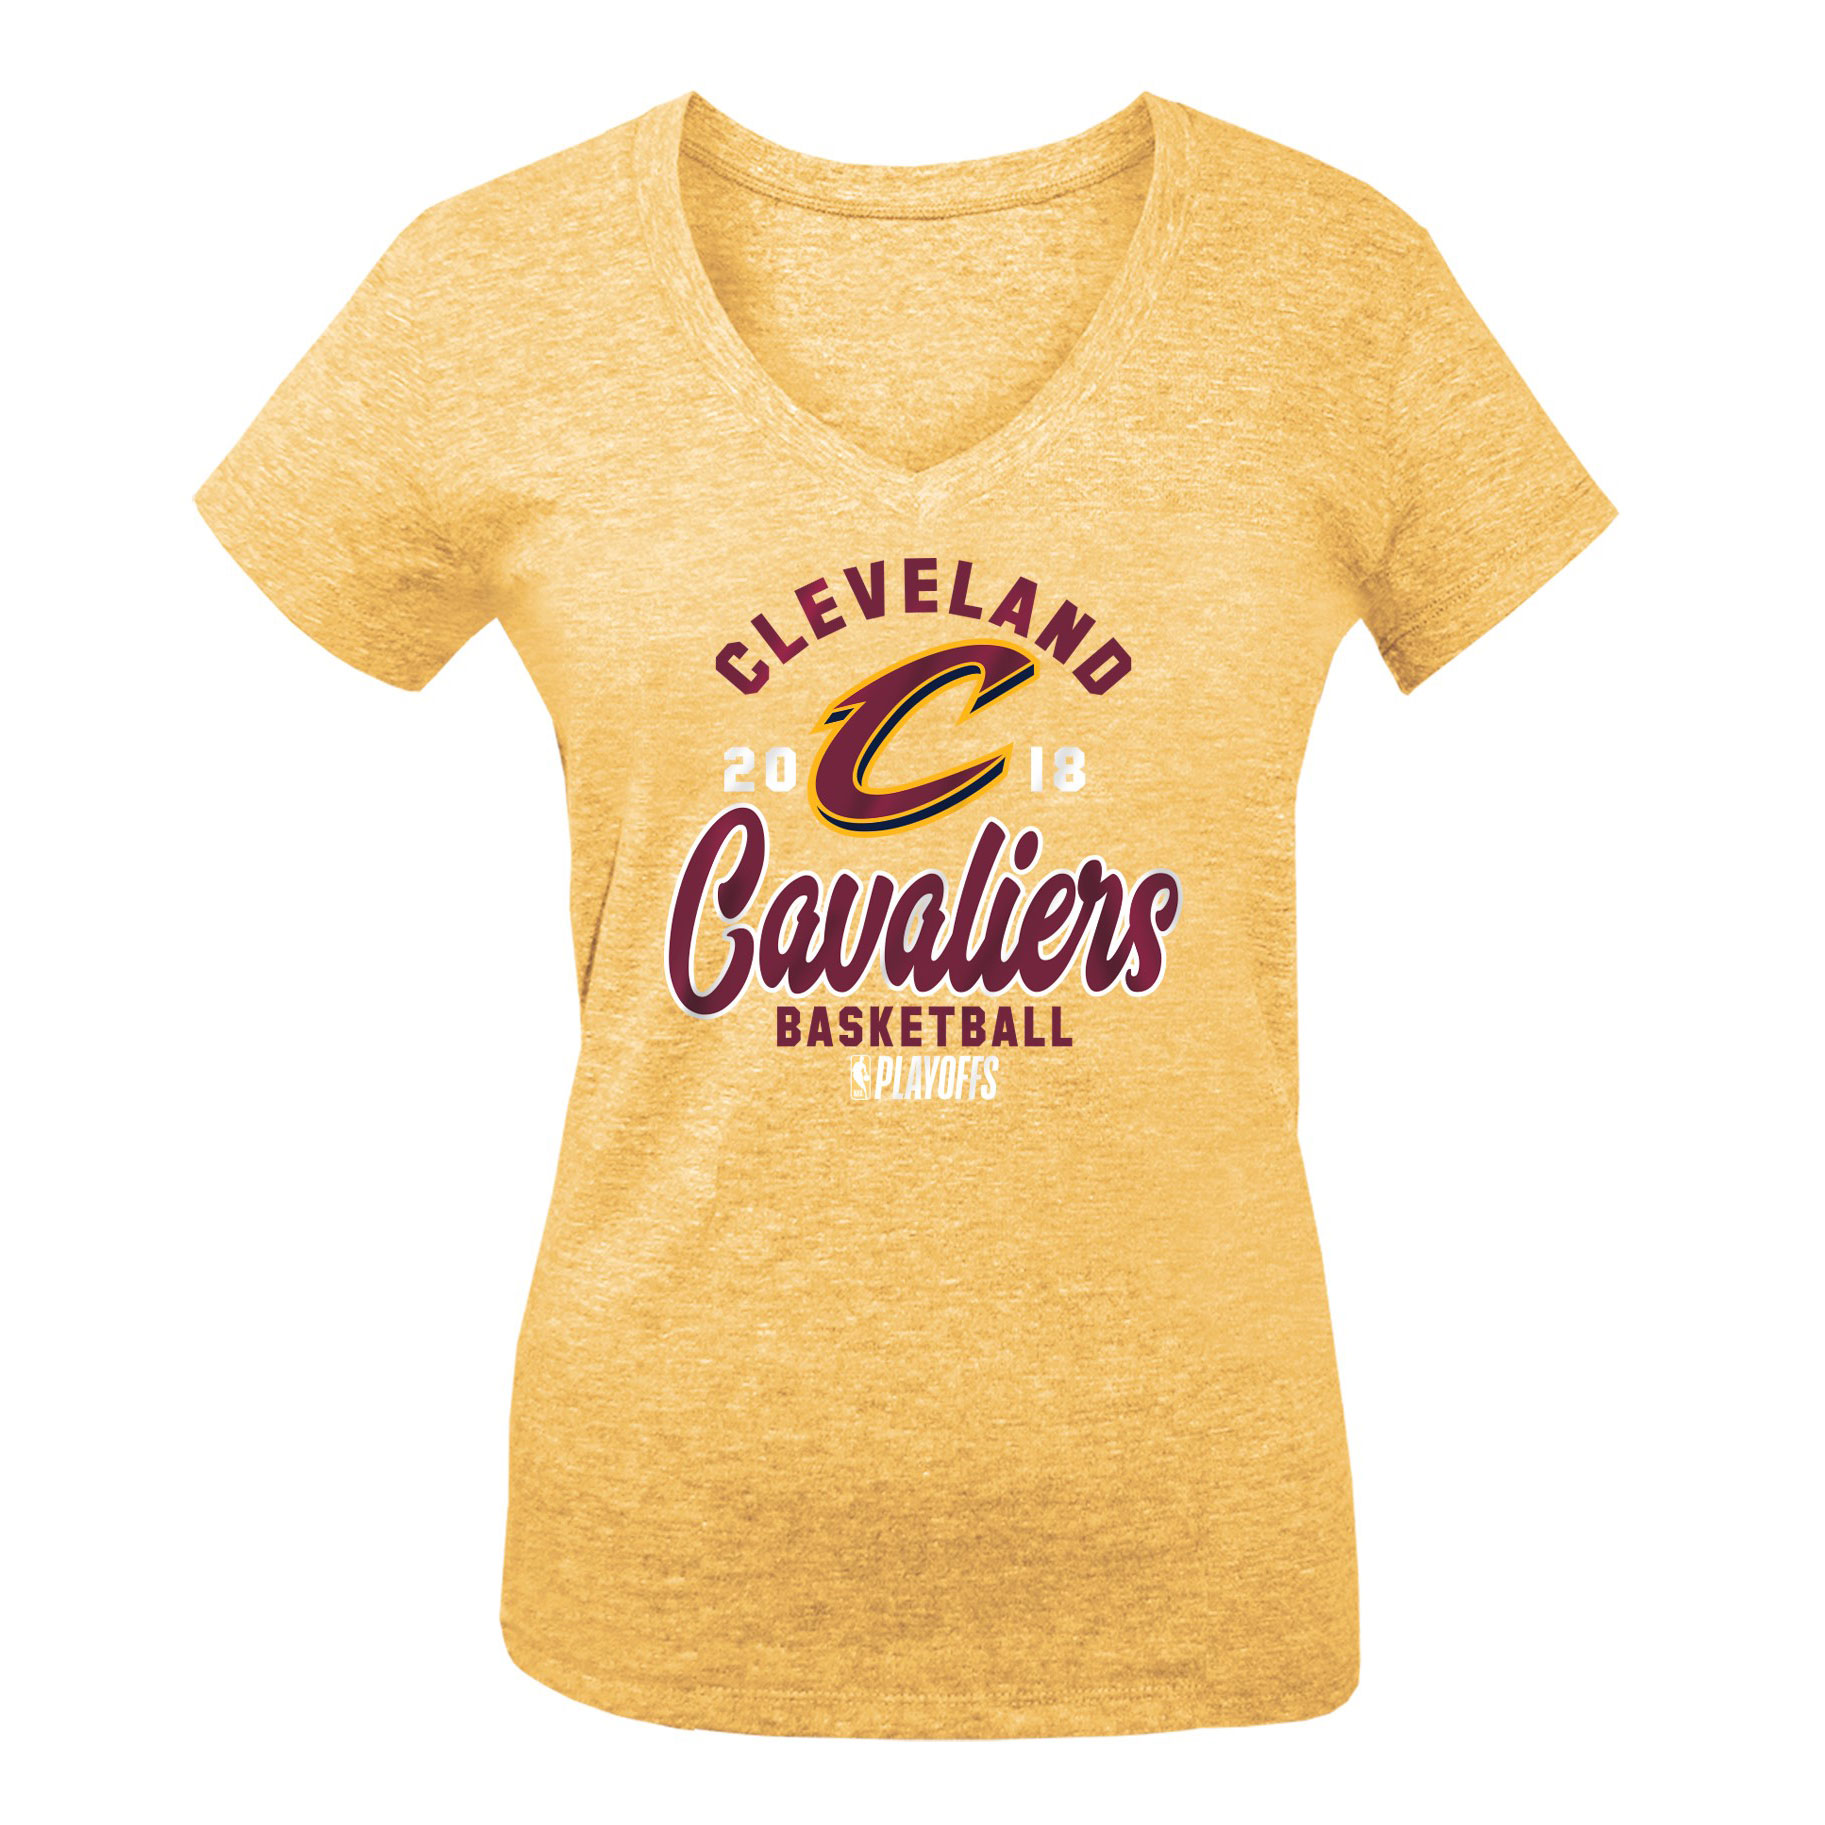 Cleveland Cavaliers New Era Girls Youth 2018 NBA Playoffs Baby Jersey V-Neck T-Shirt - Gold